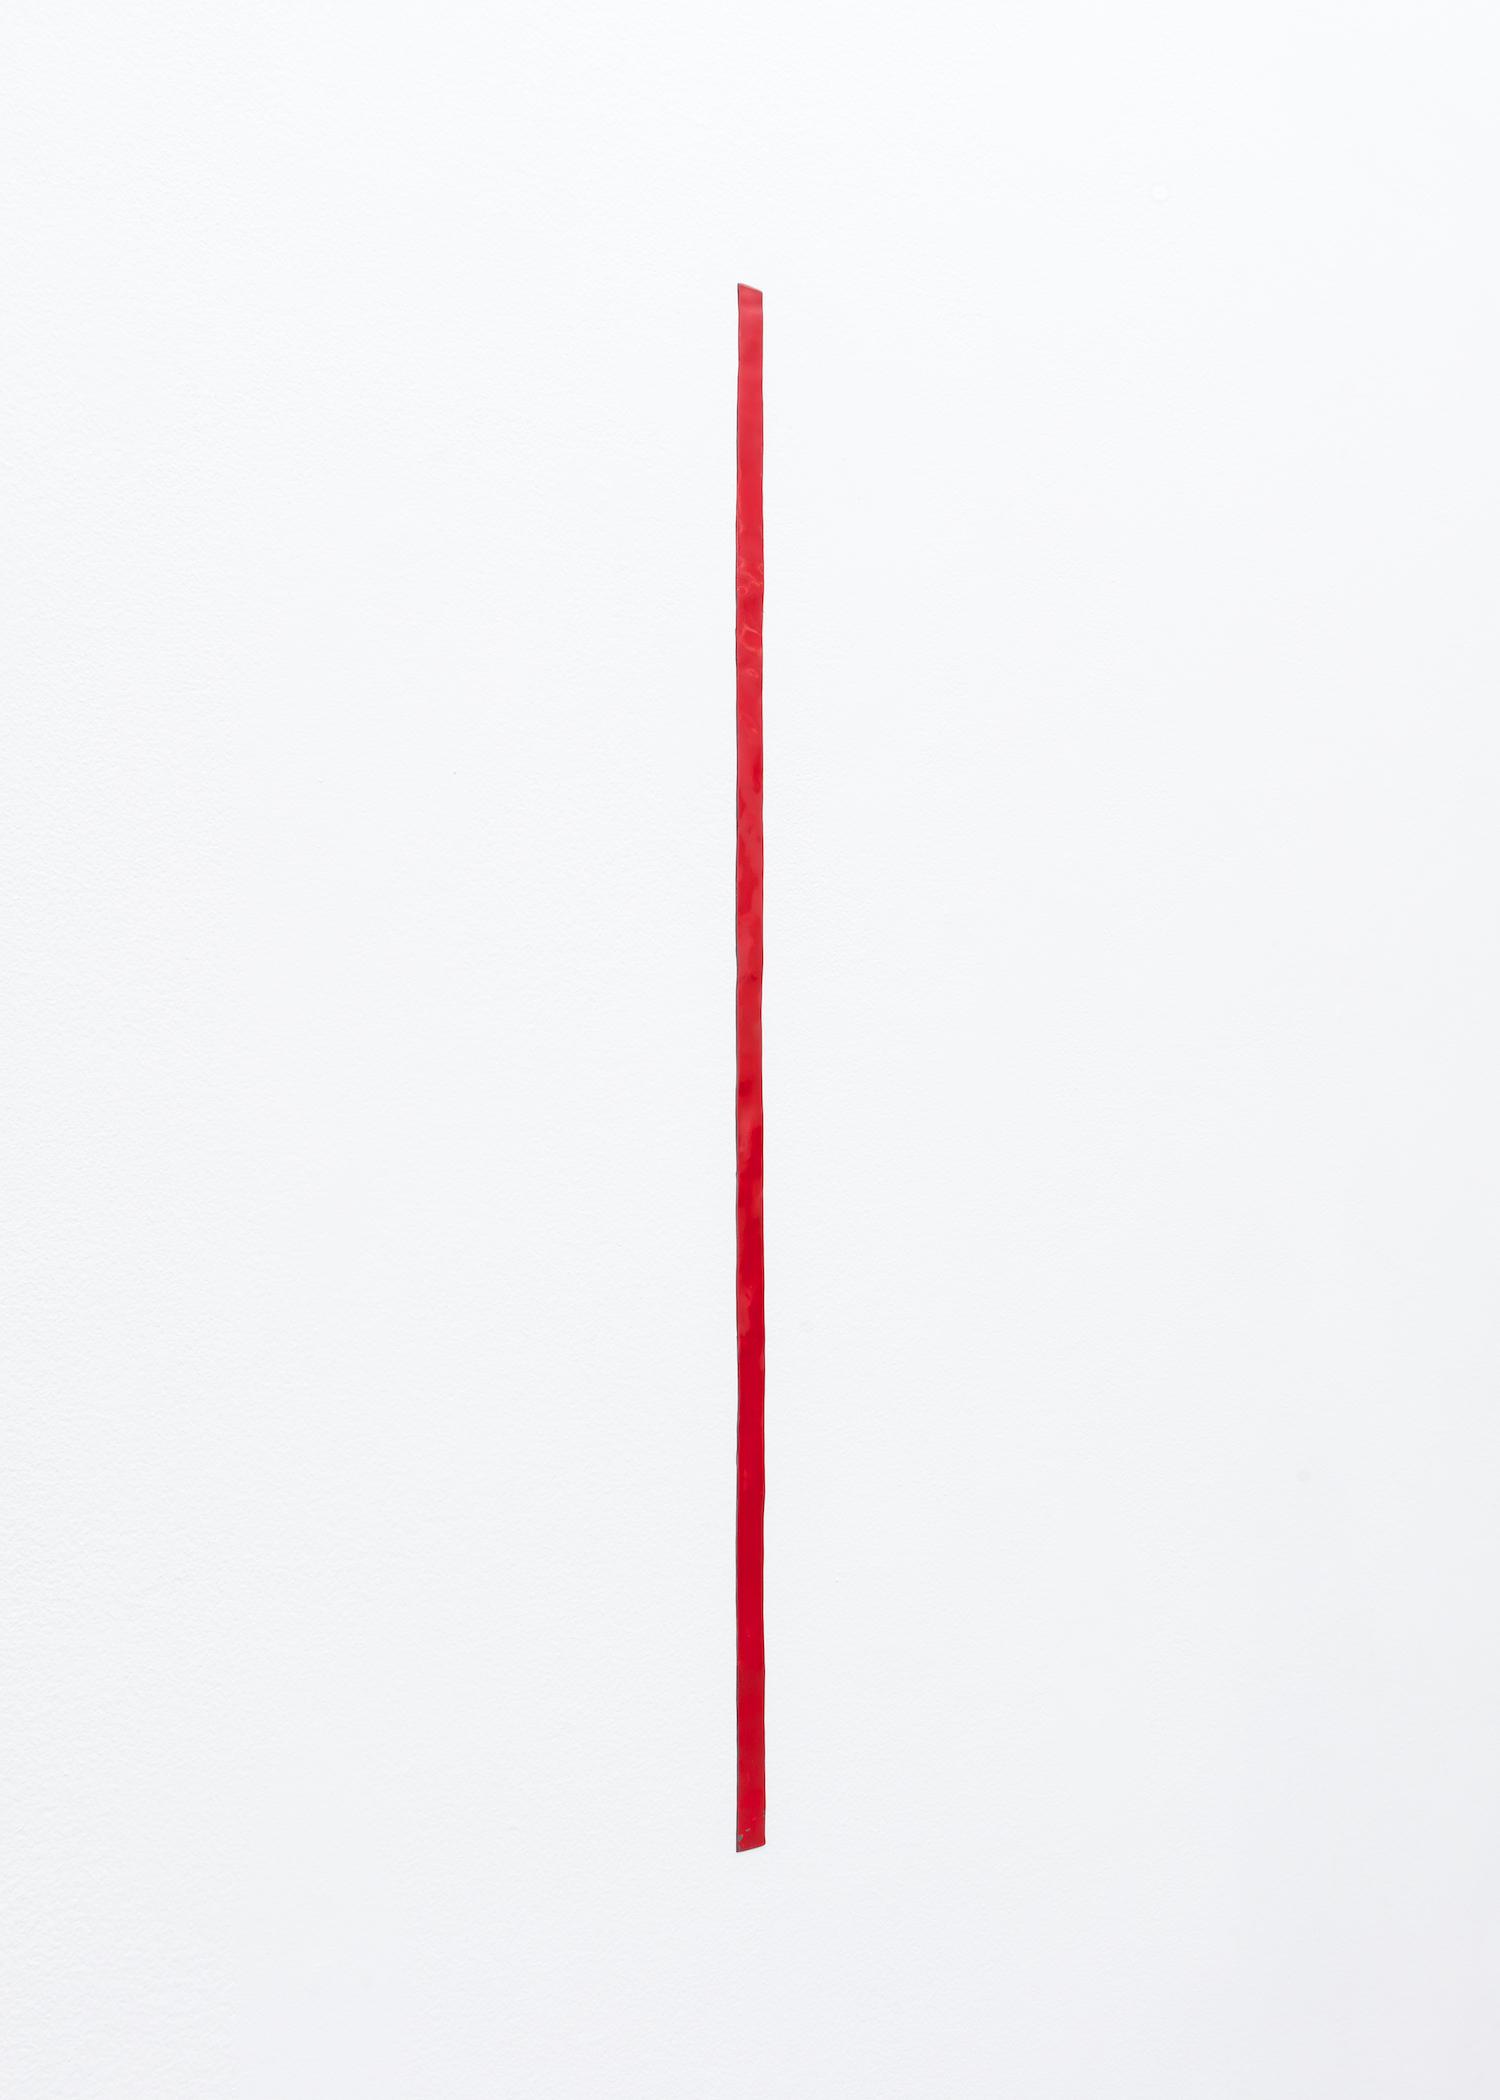 Nancy Brooks Brody  39 inch Measure (red 1)  2014 Oil enamel on lead embedded into wall 39h x 1w in NBB003